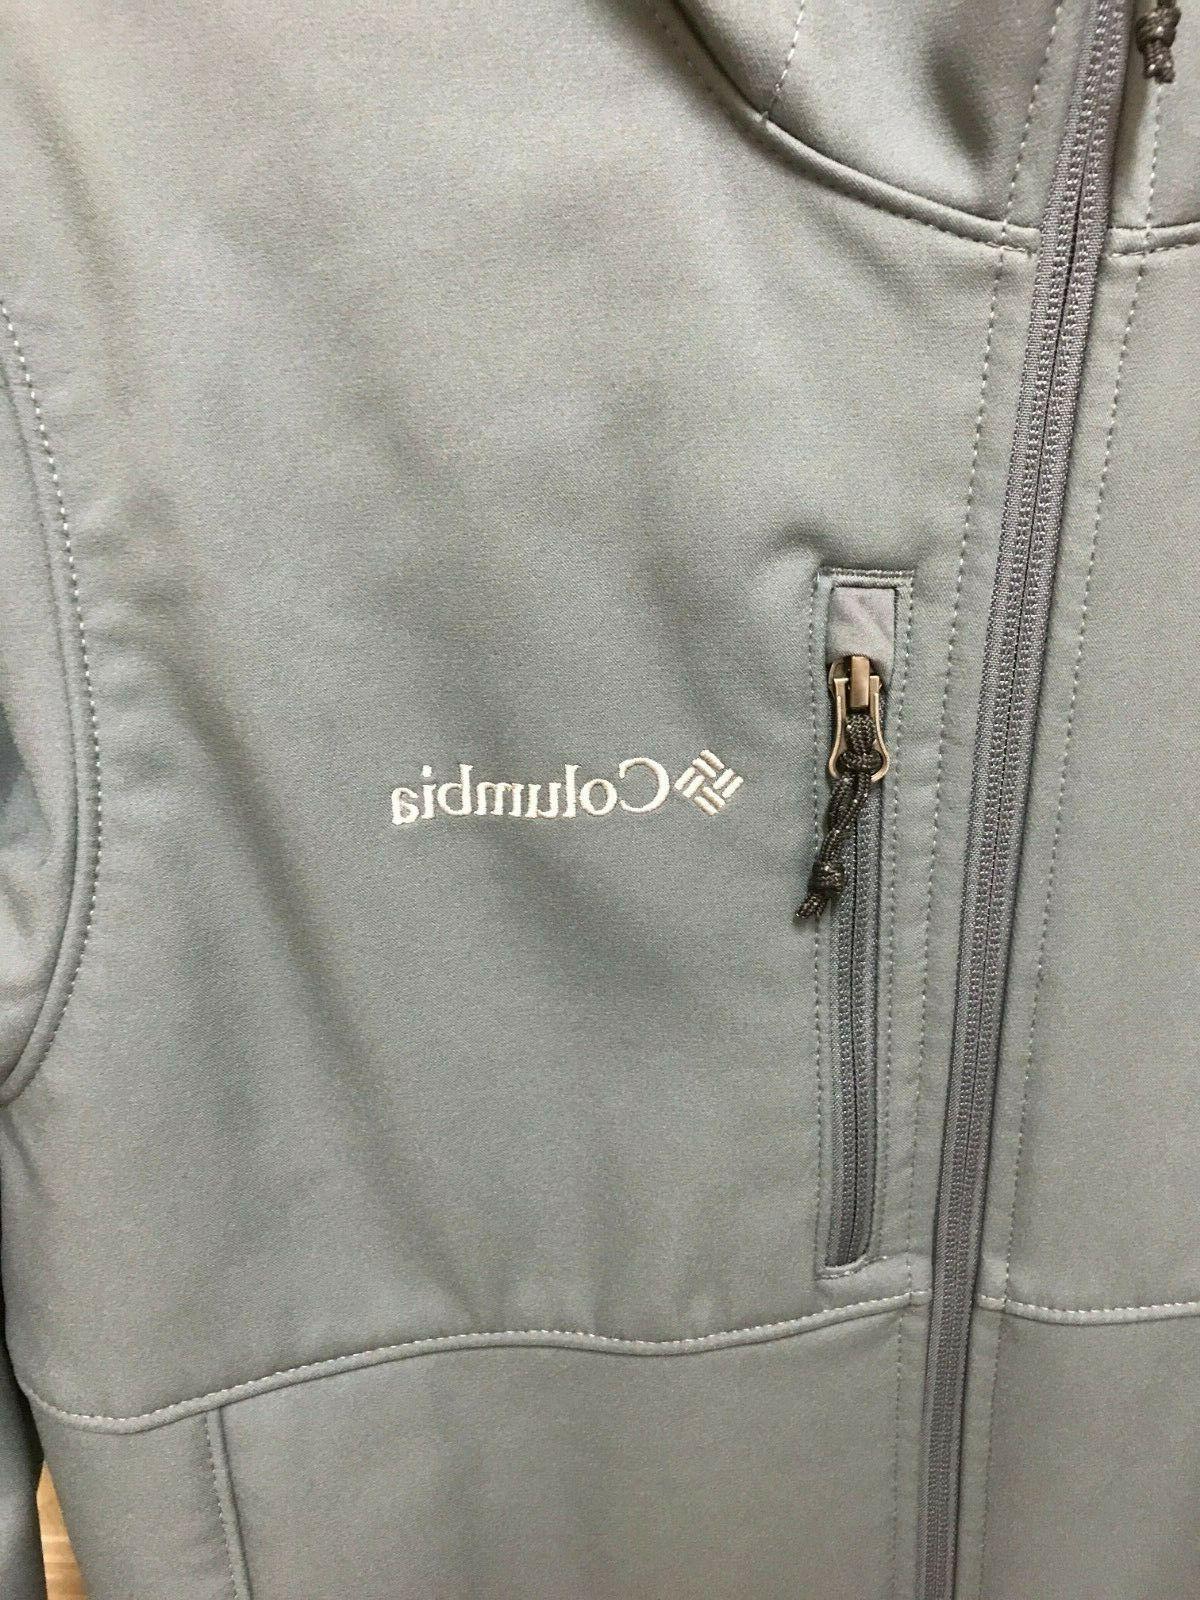 Columbia Ascender Hooded Softshell Jacket Men's Small Gray